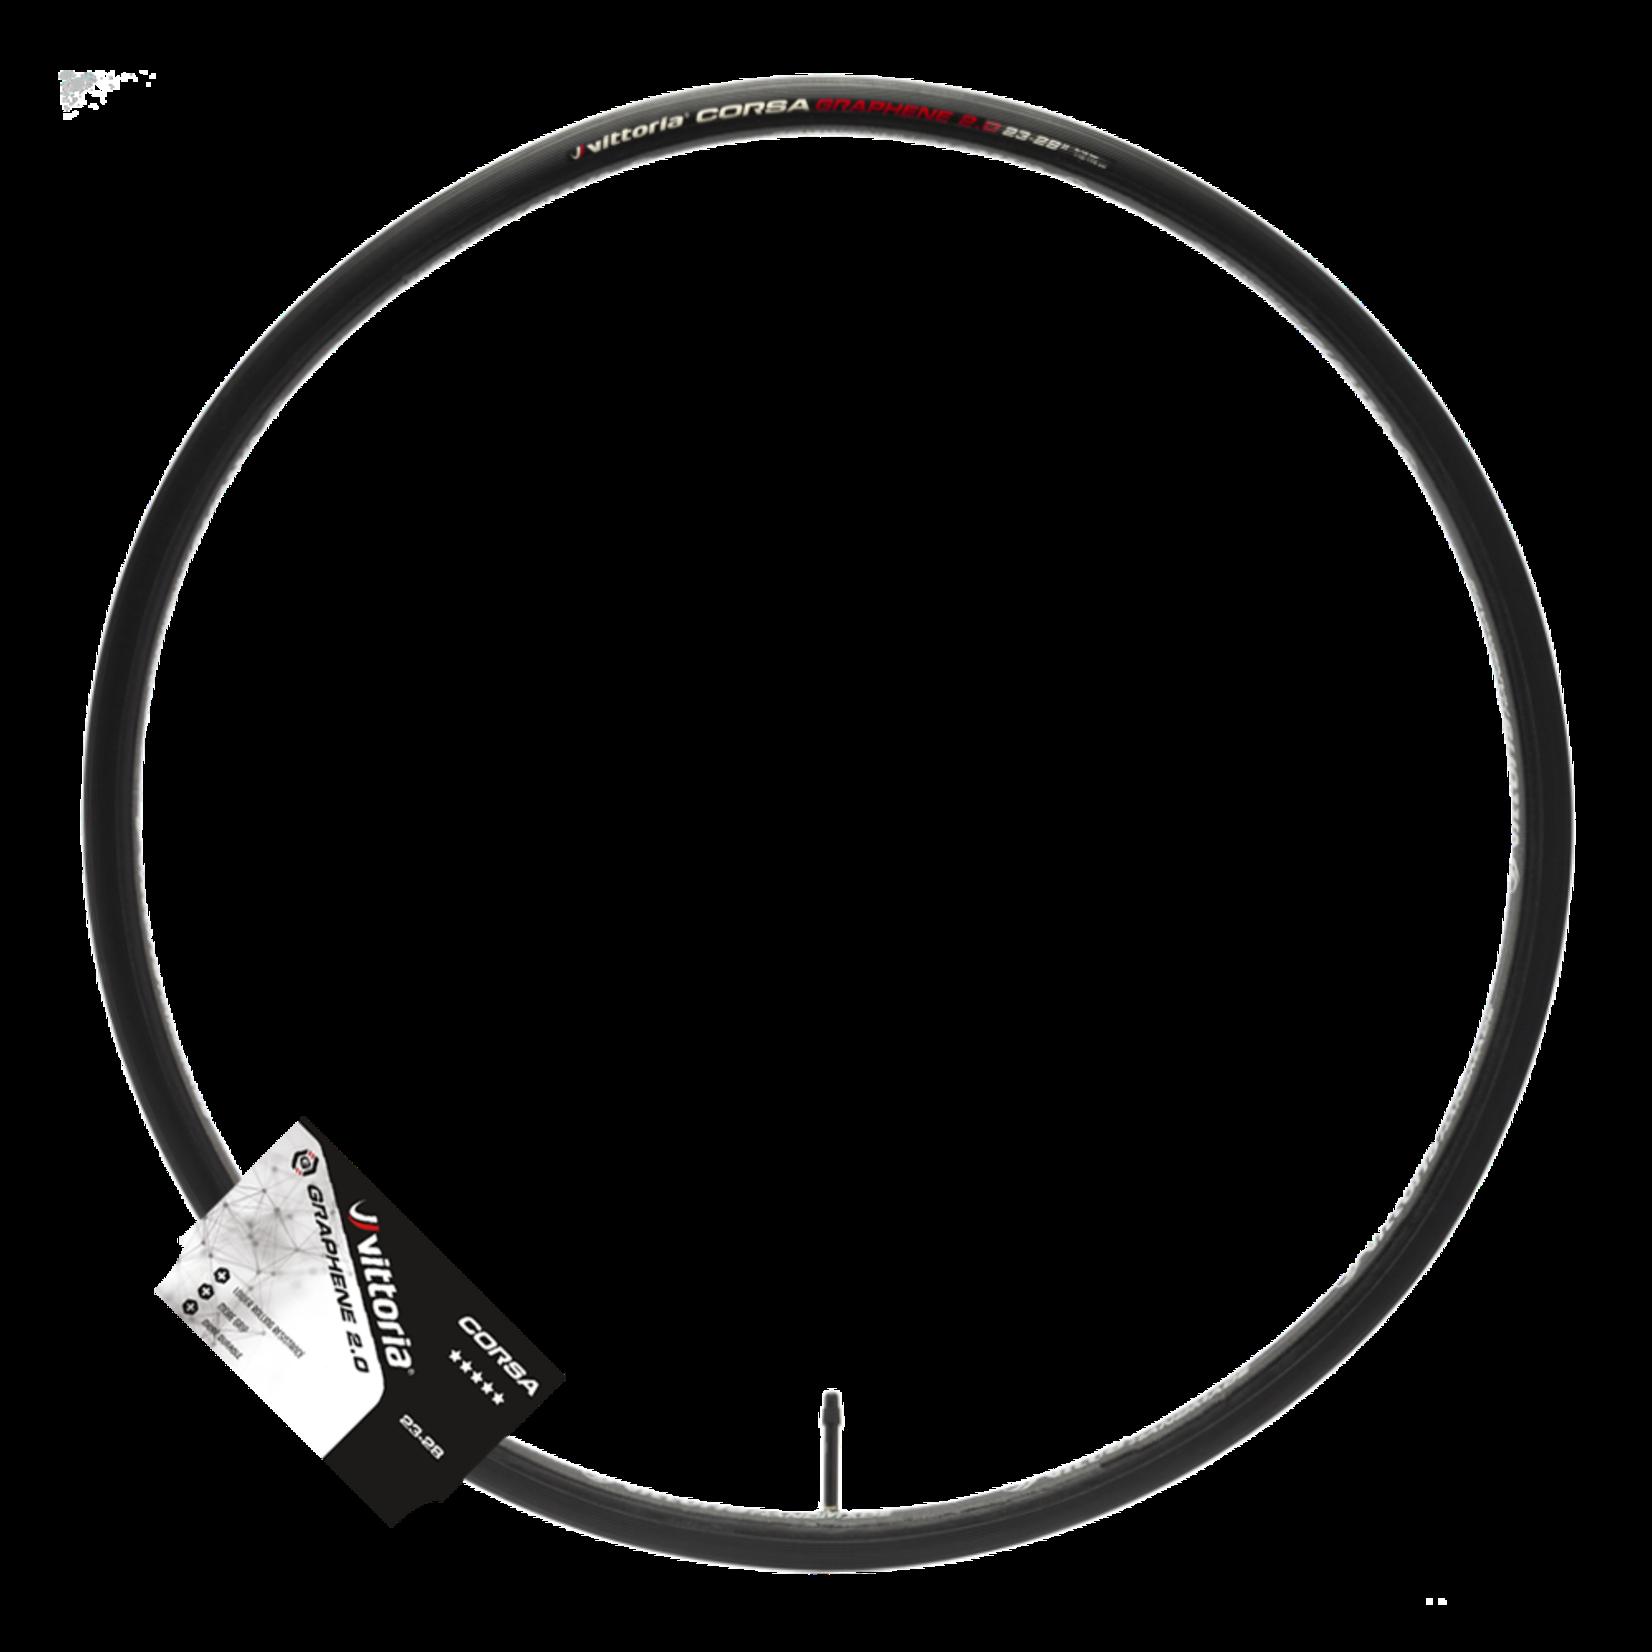 Vittoria Corsa Tubular Tire